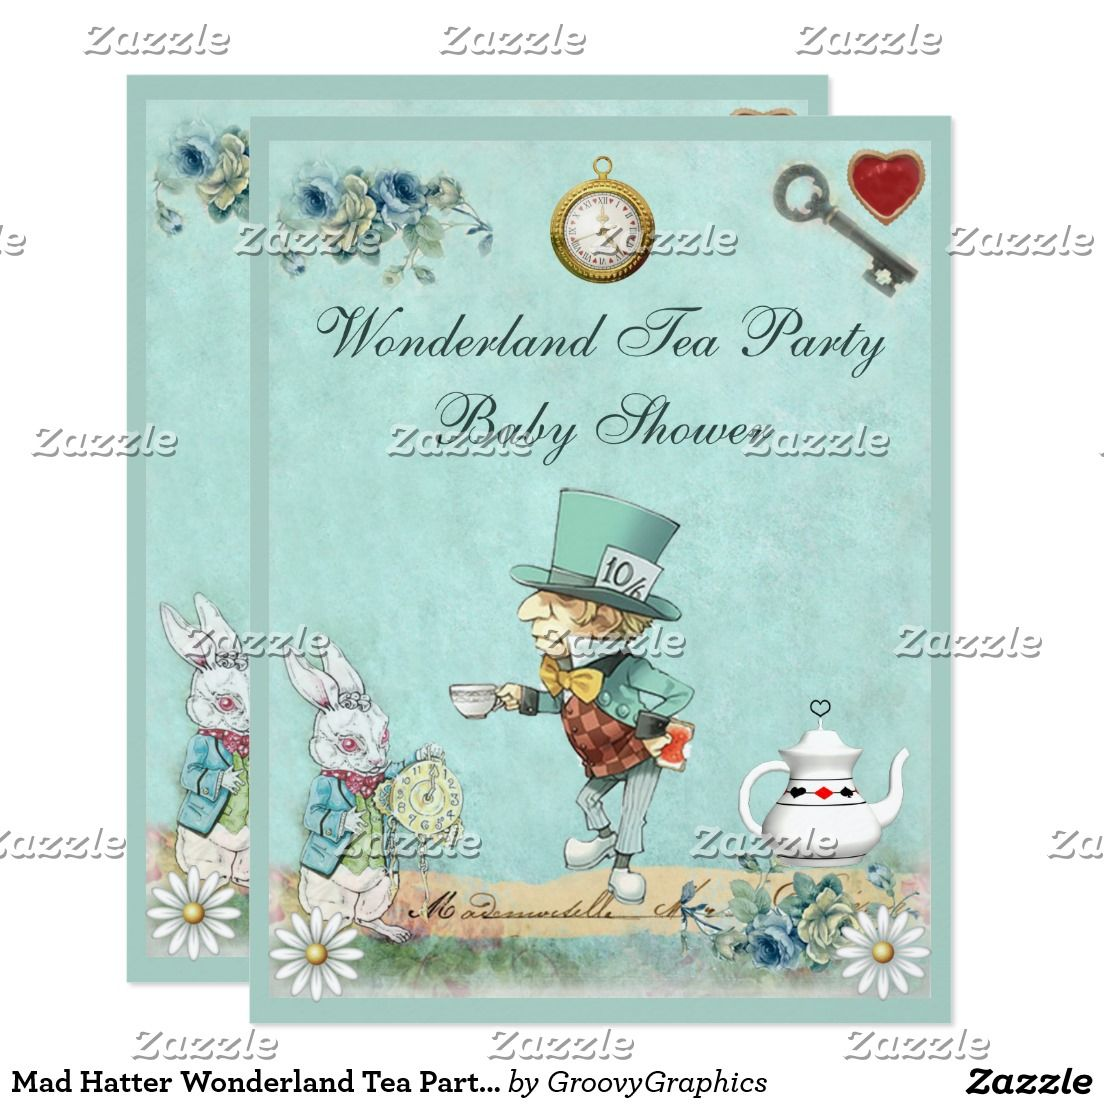 mad hatter wonderland tea party baby shower card | tea party, Baby shower invitations